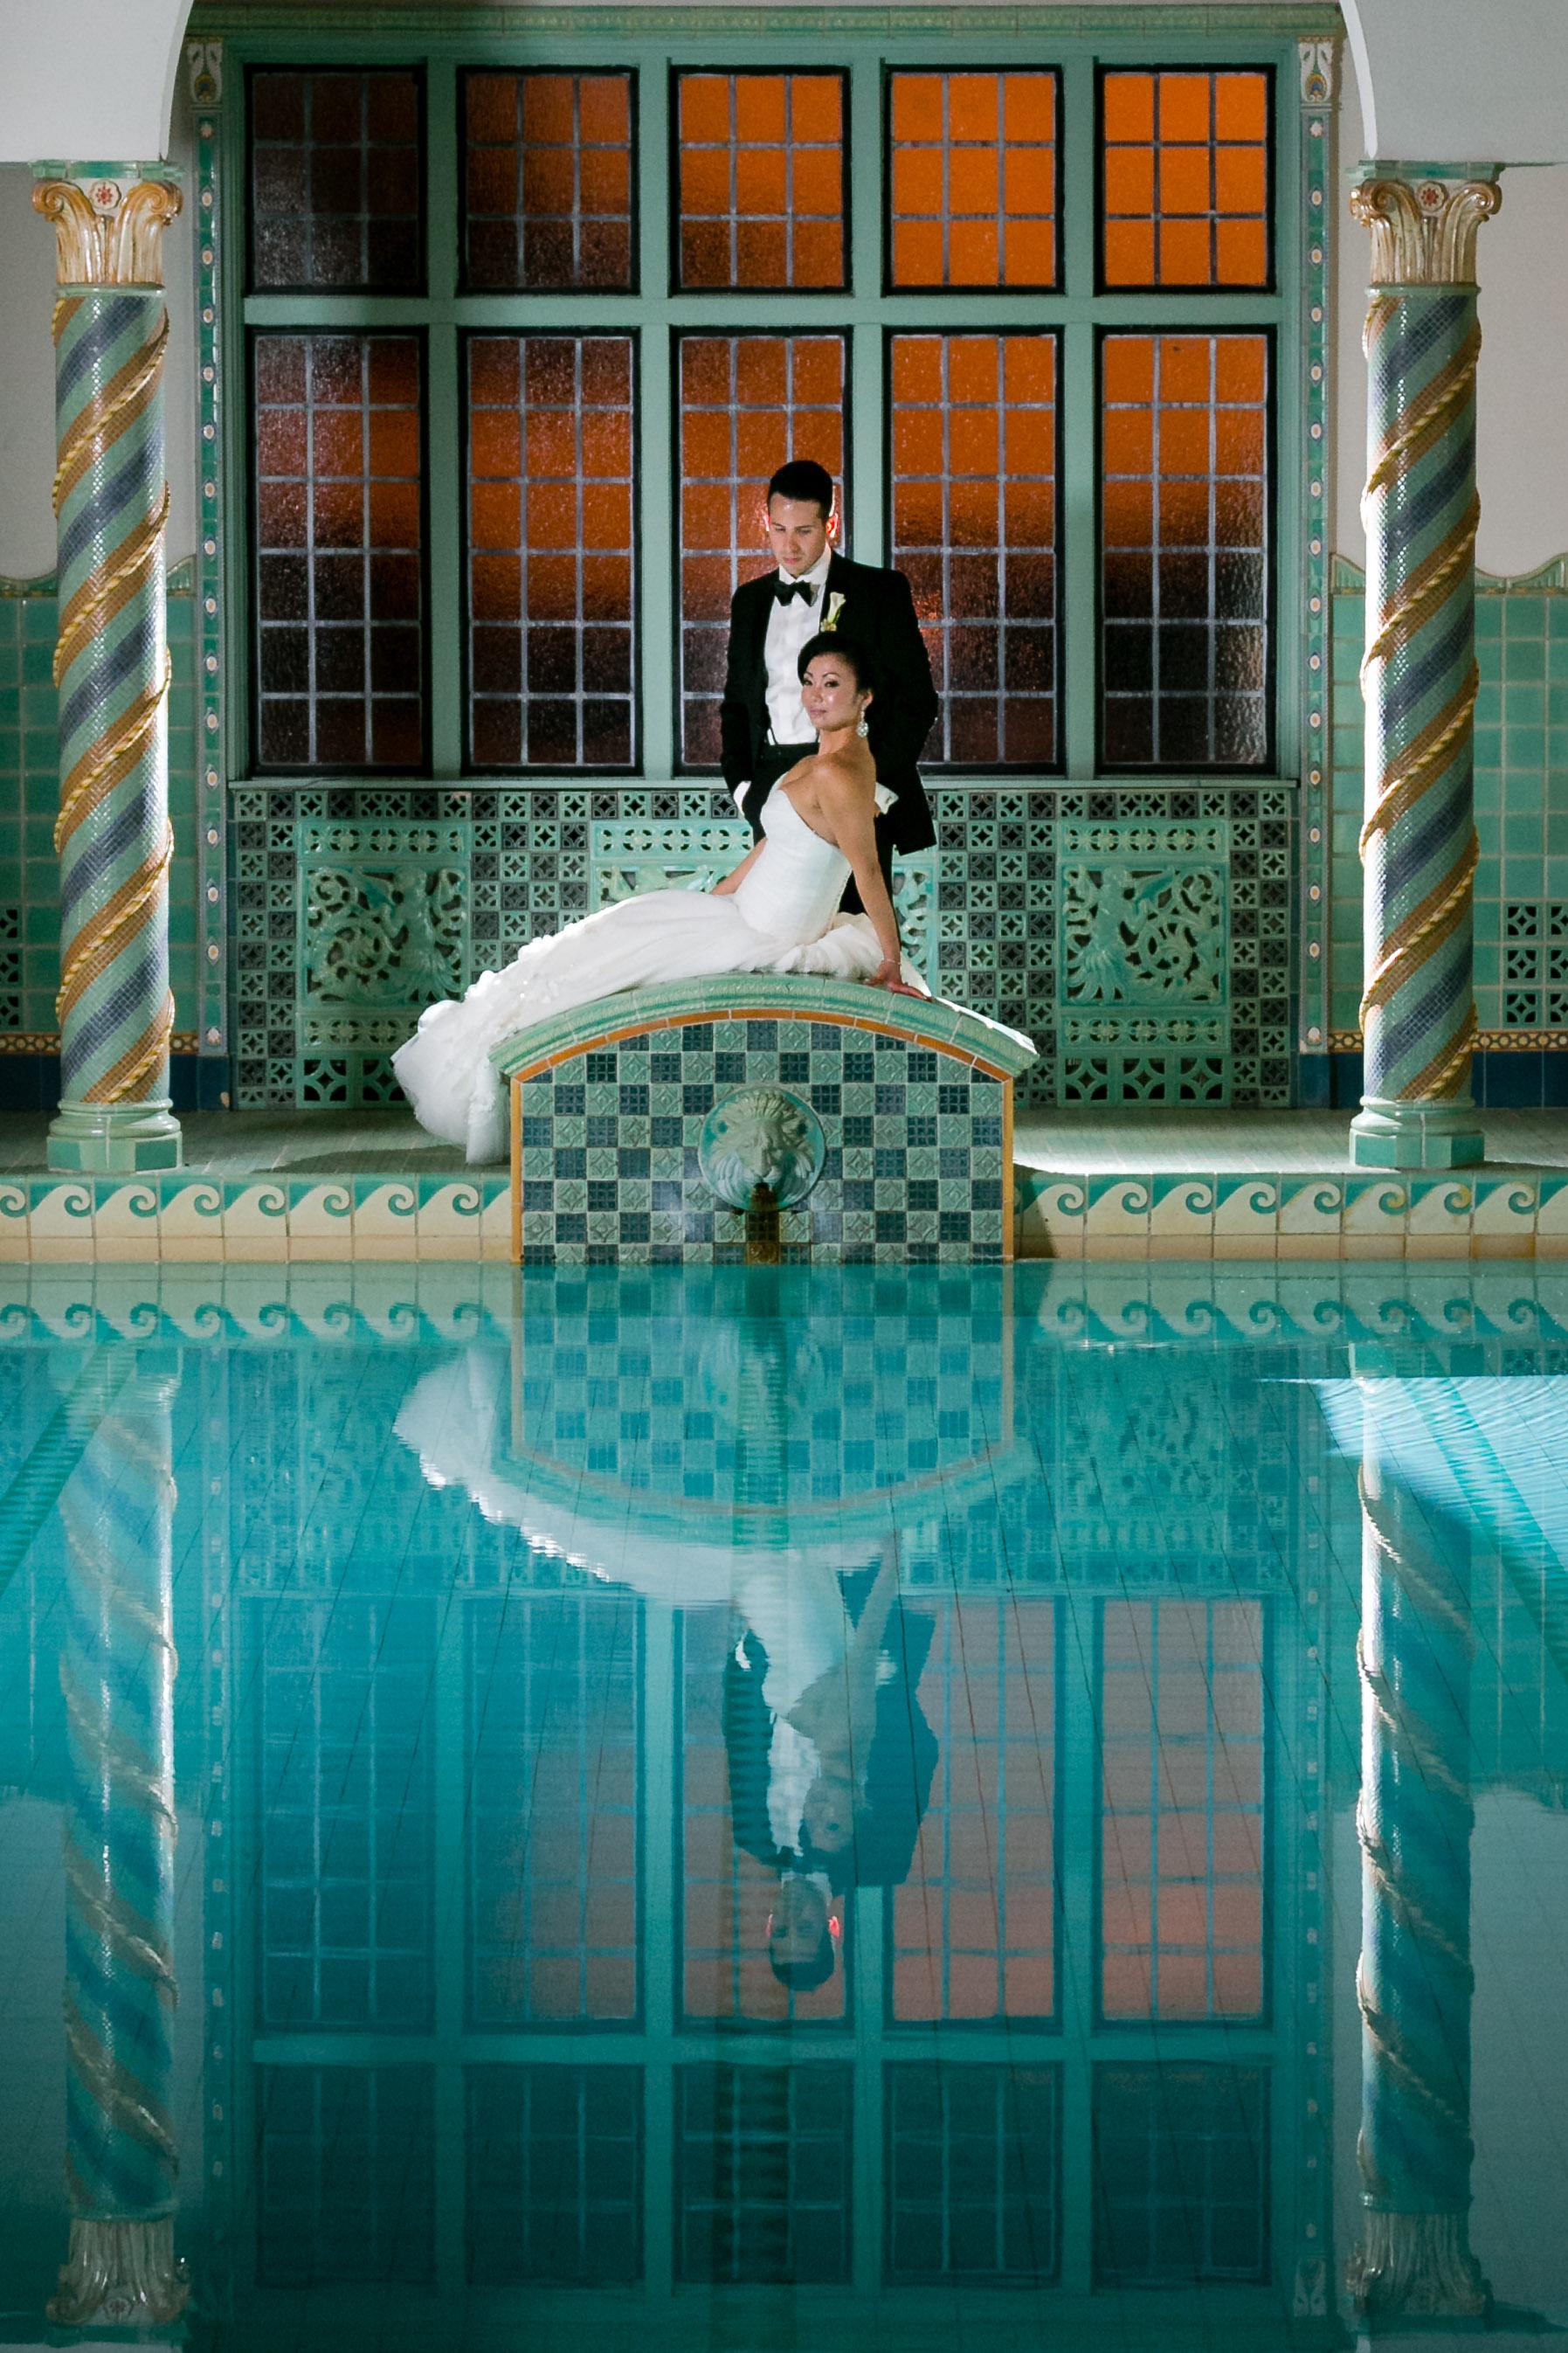 Luxurious-Chinese-Italian-Wedding-Pleasantdale-Chateau-West-Orange-New-Jersey-Photojournalisti-Wedding-Photography-Jacek-Dolata-33.jpg